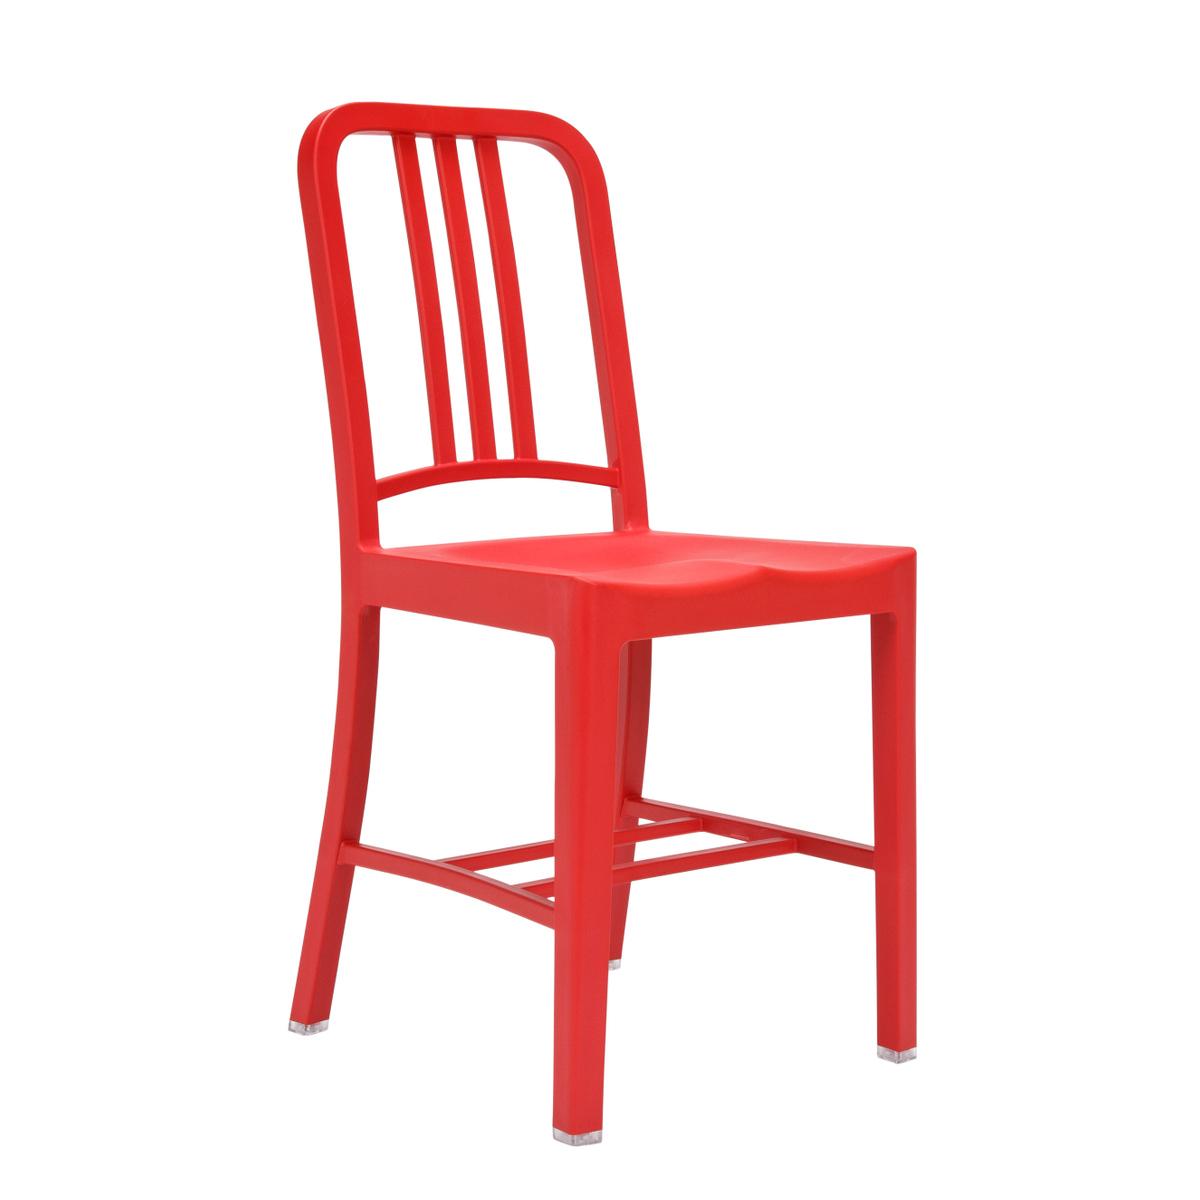 111 navy chair. Black Bedroom Furniture Sets. Home Design Ideas